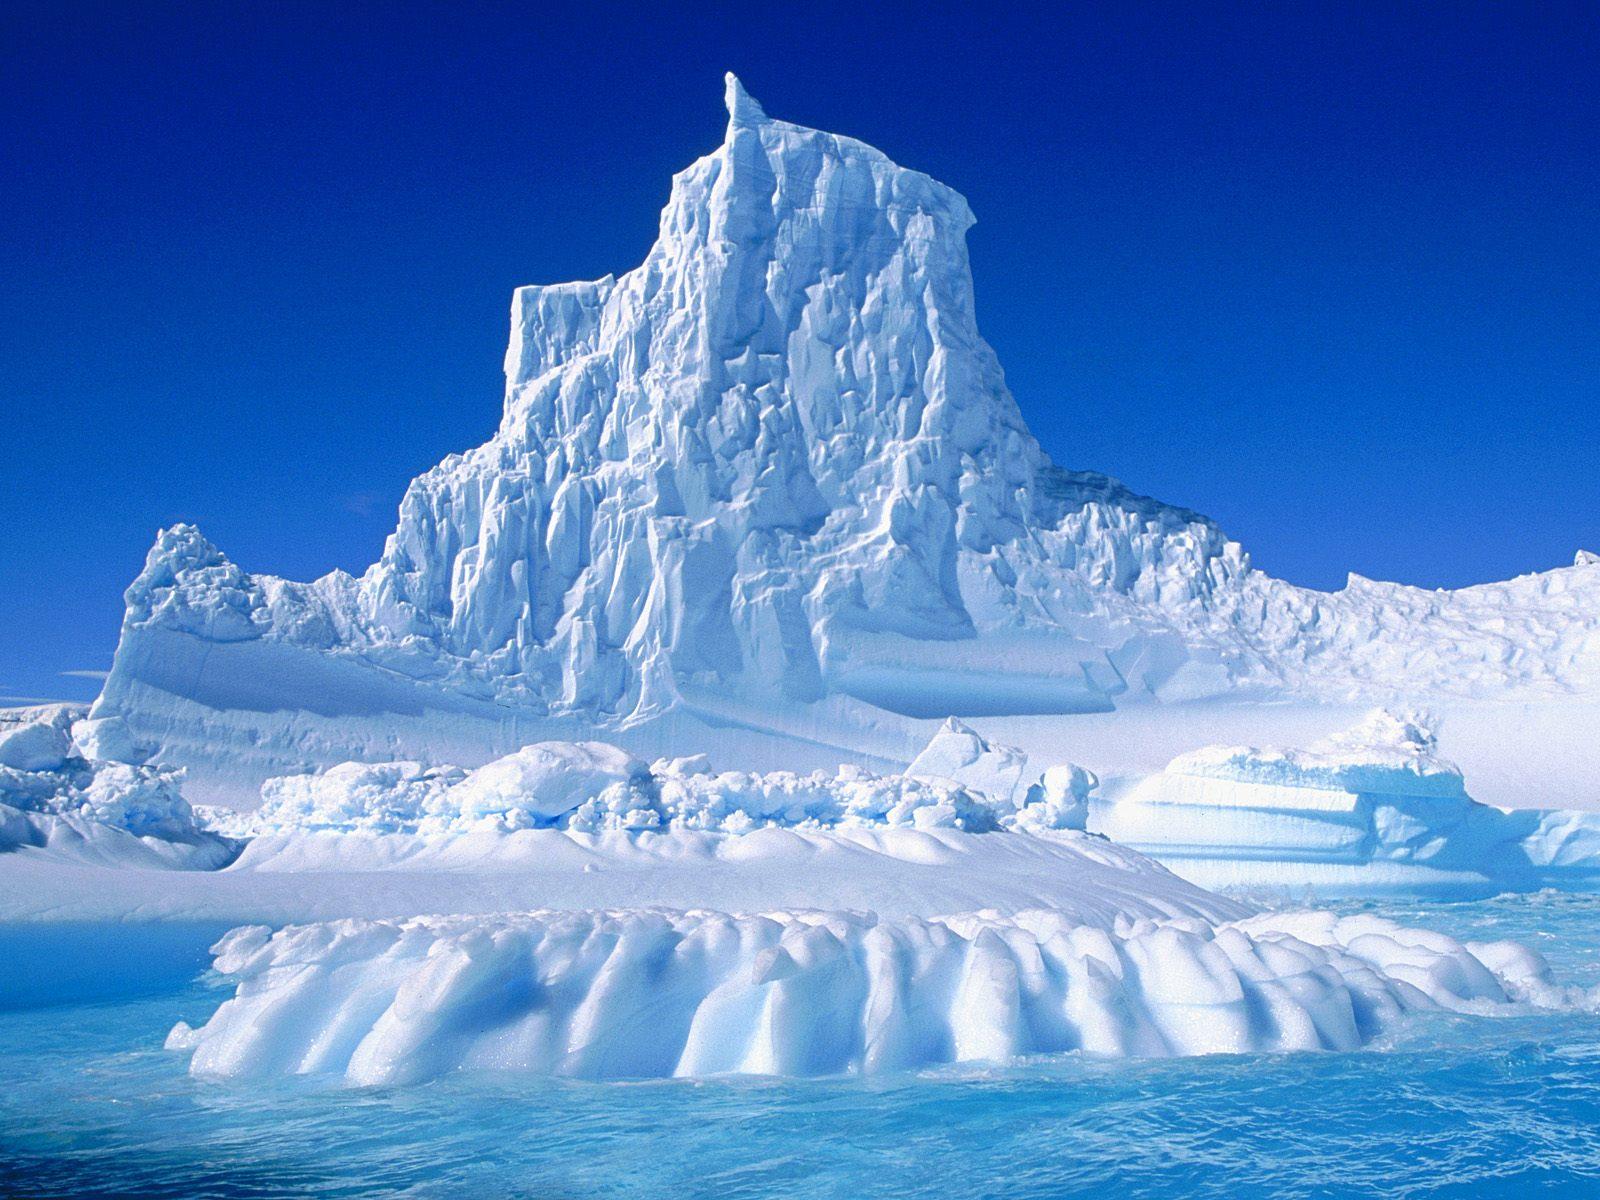 Guerra de imagenes! - Página 4 Eroded-Iceberg-in-the-Lemaire-Channel-antartica-23340741-1600-1200